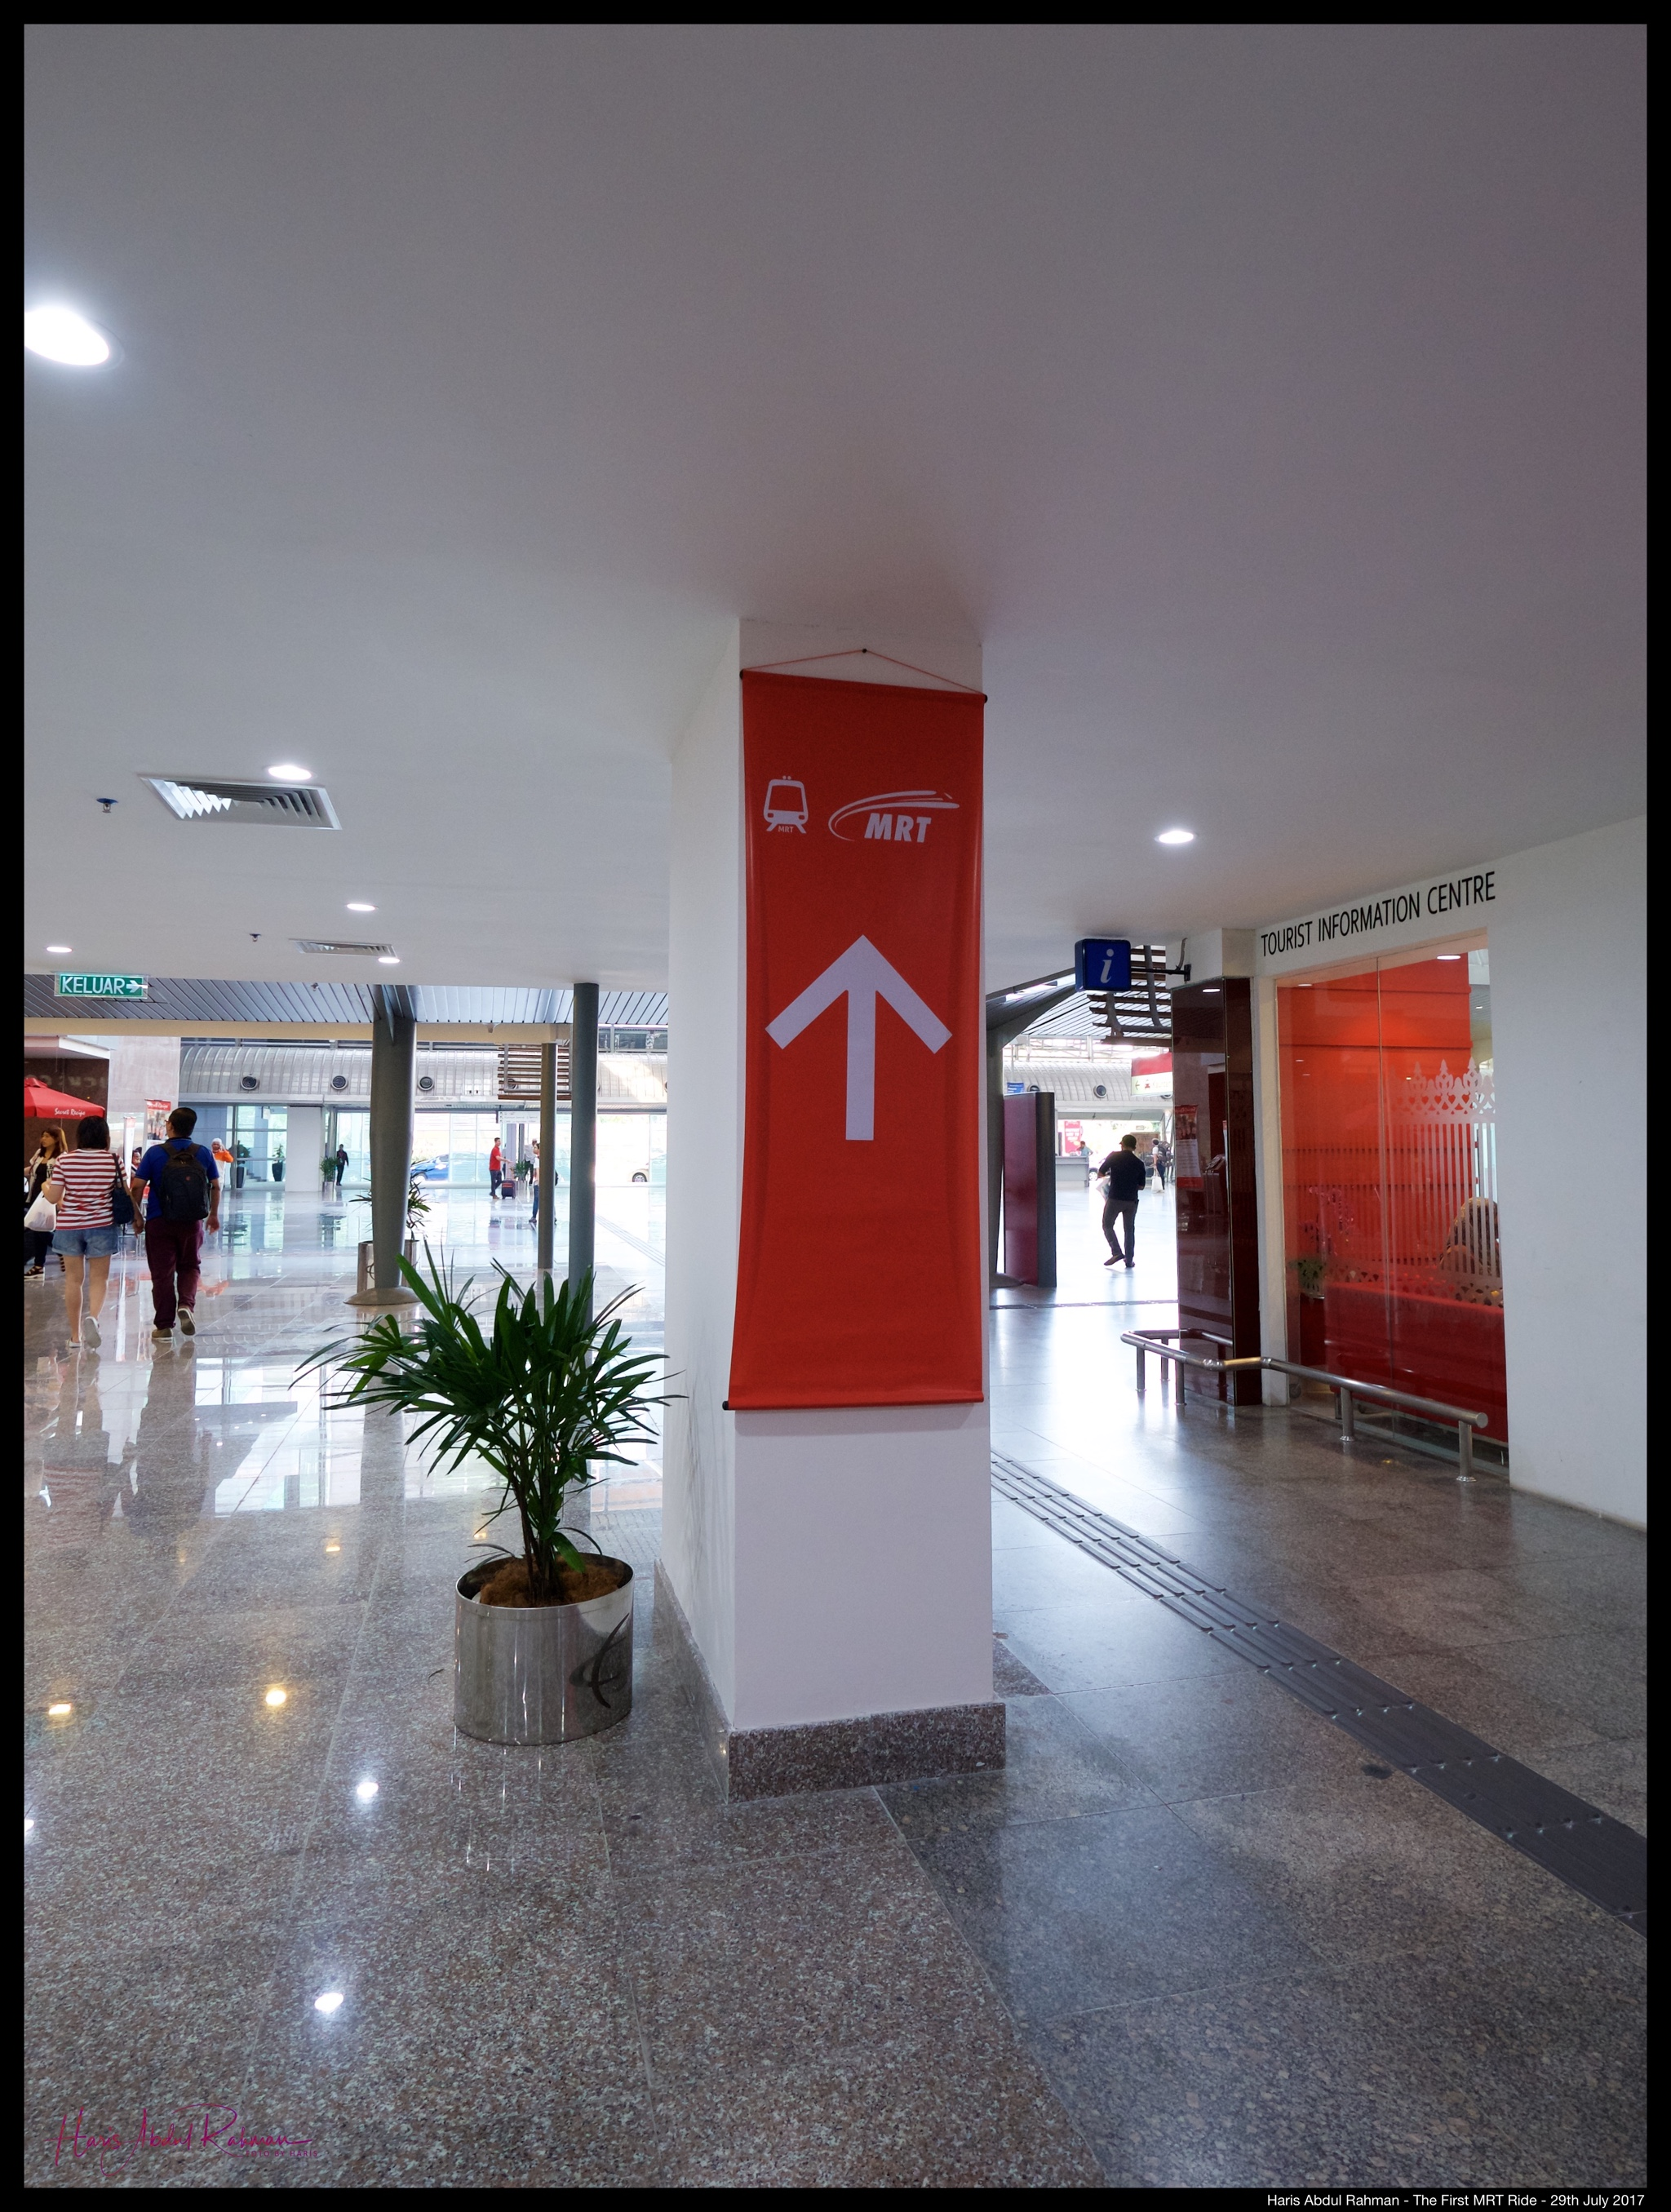 This way ...